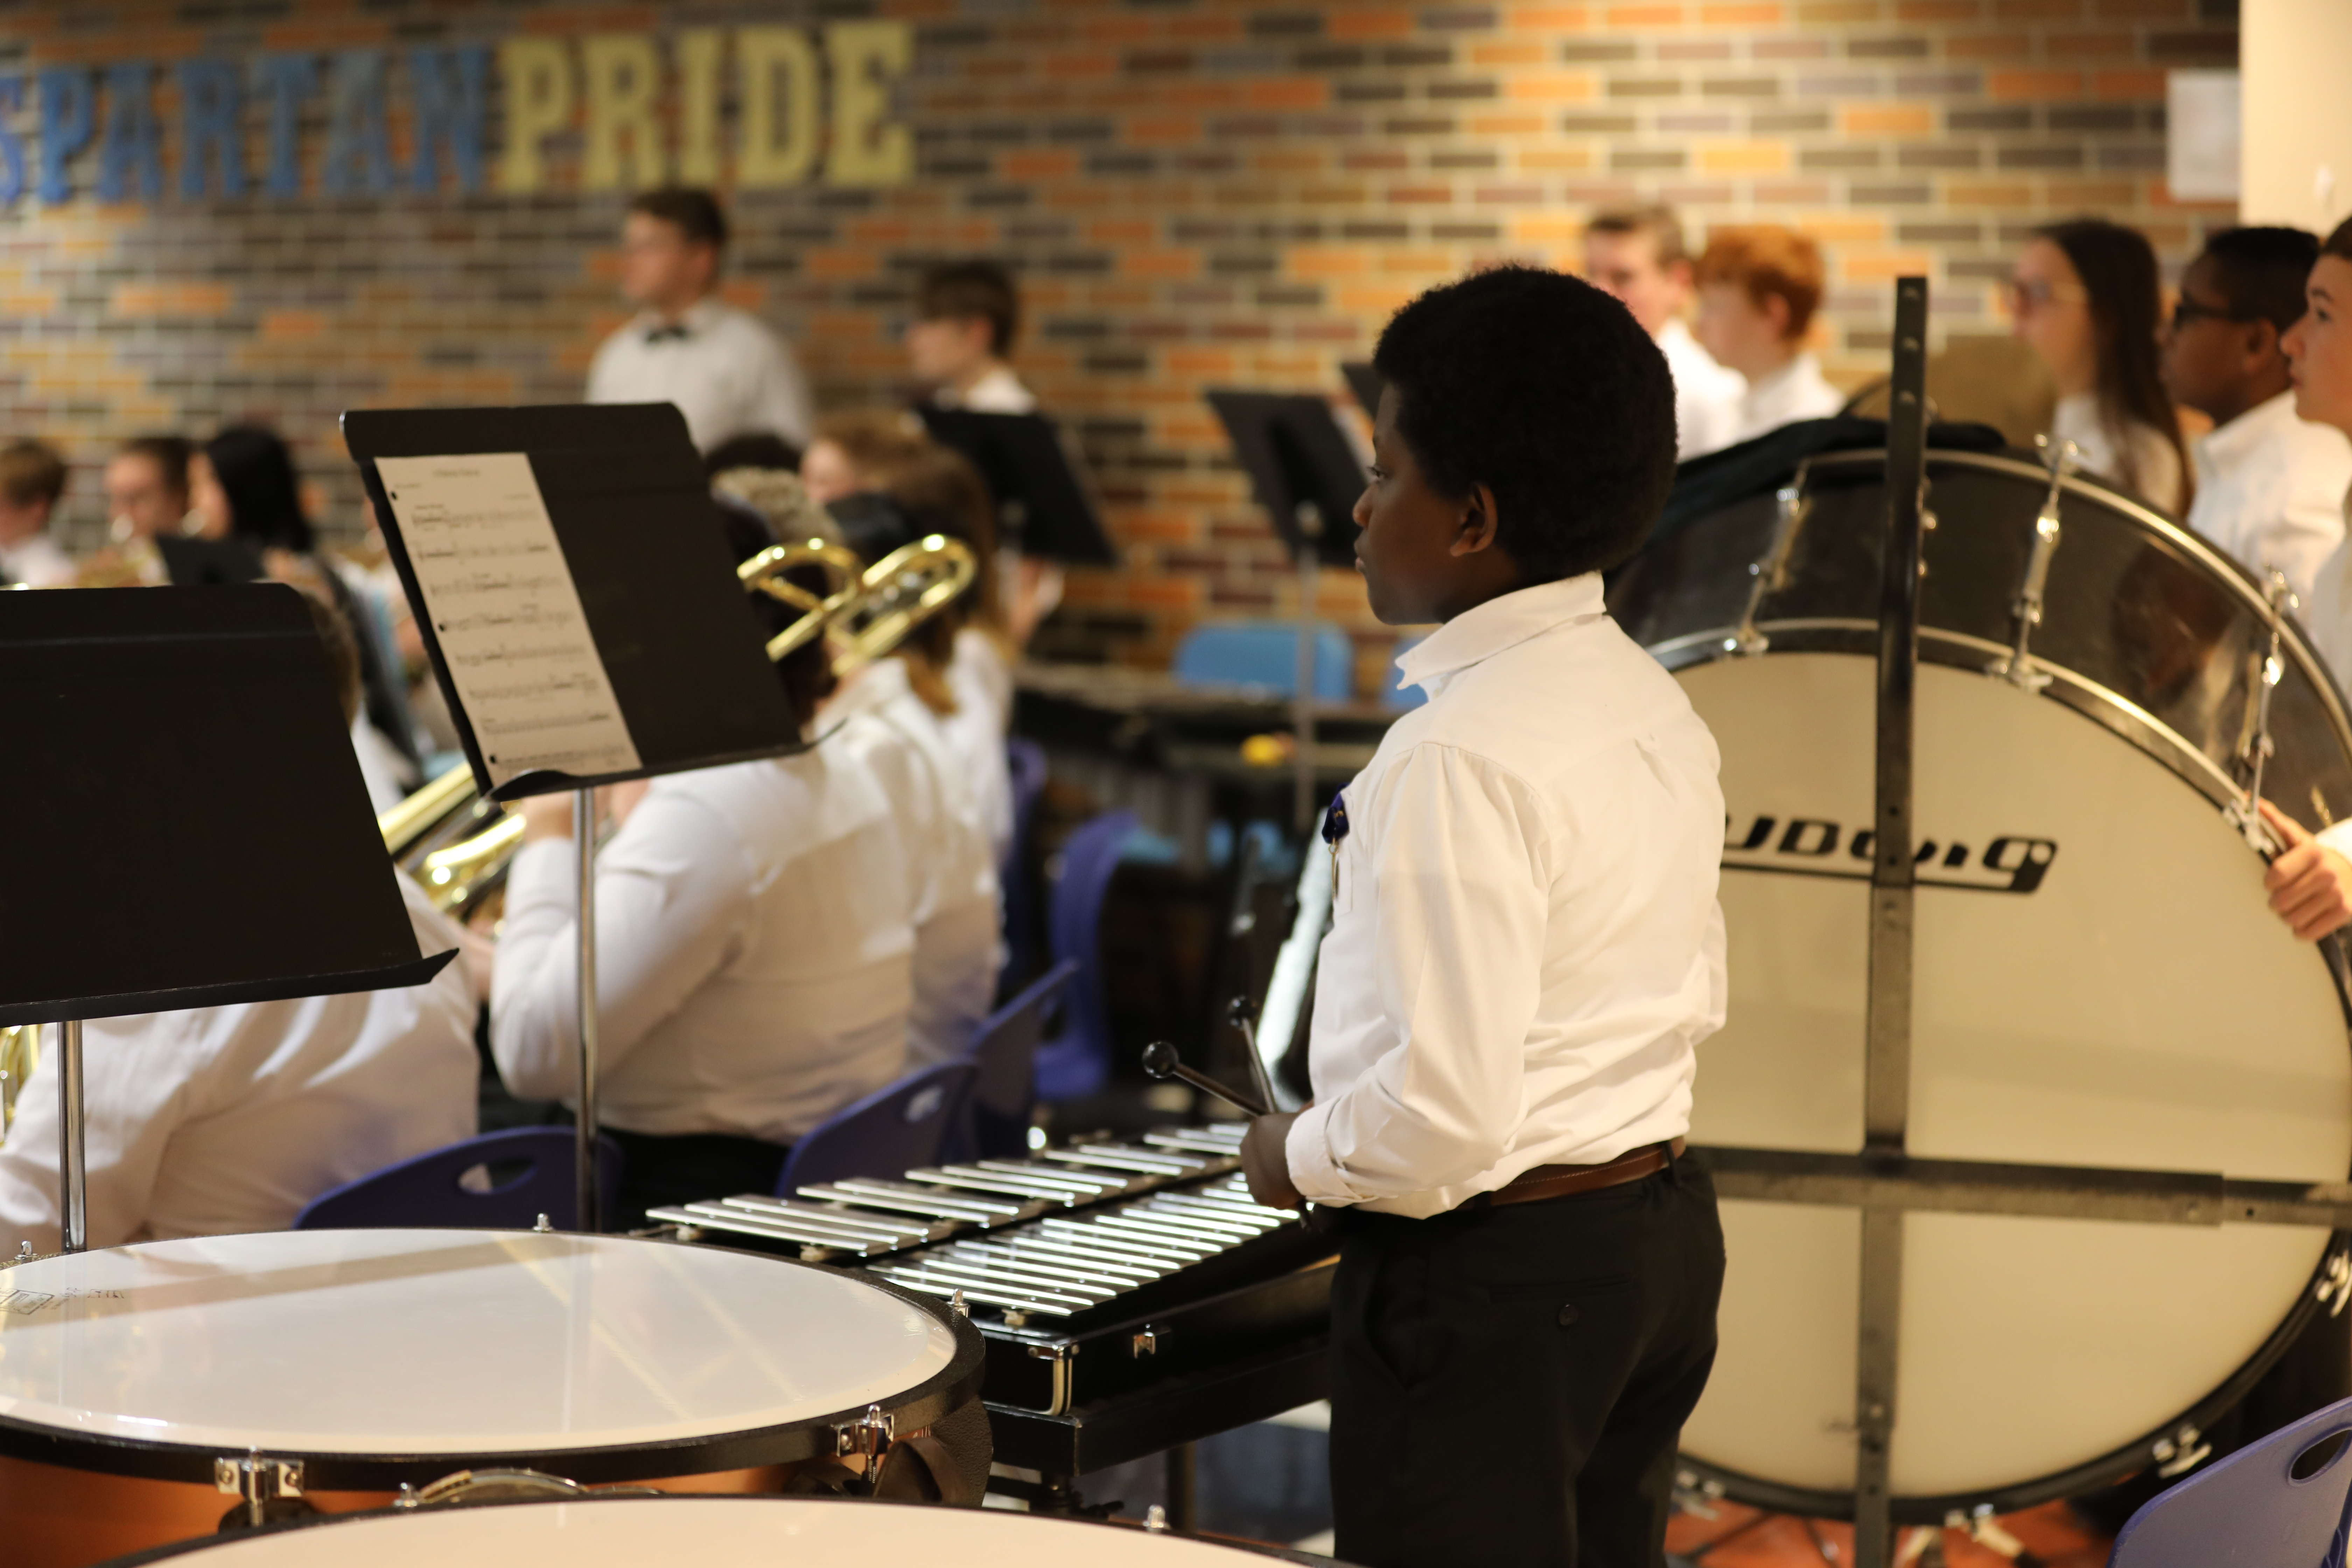 Schmucker Music Student at 2020 Veteran's Day program